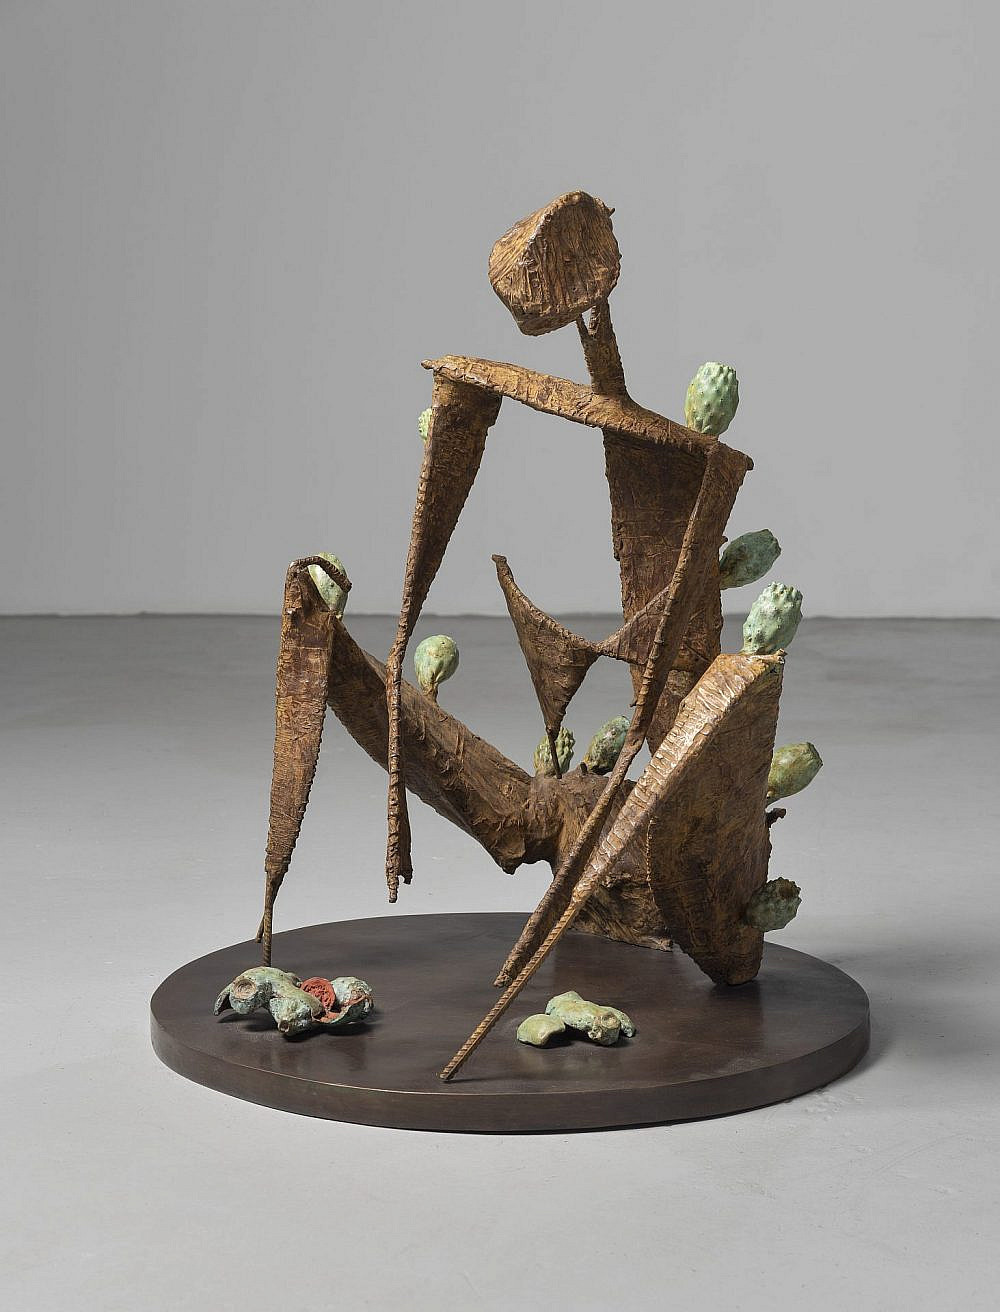 """Prickly Pair Lady"" של סיגלית לנדאו. מתוך התערוכה (צילום: יחסי ציבור)"